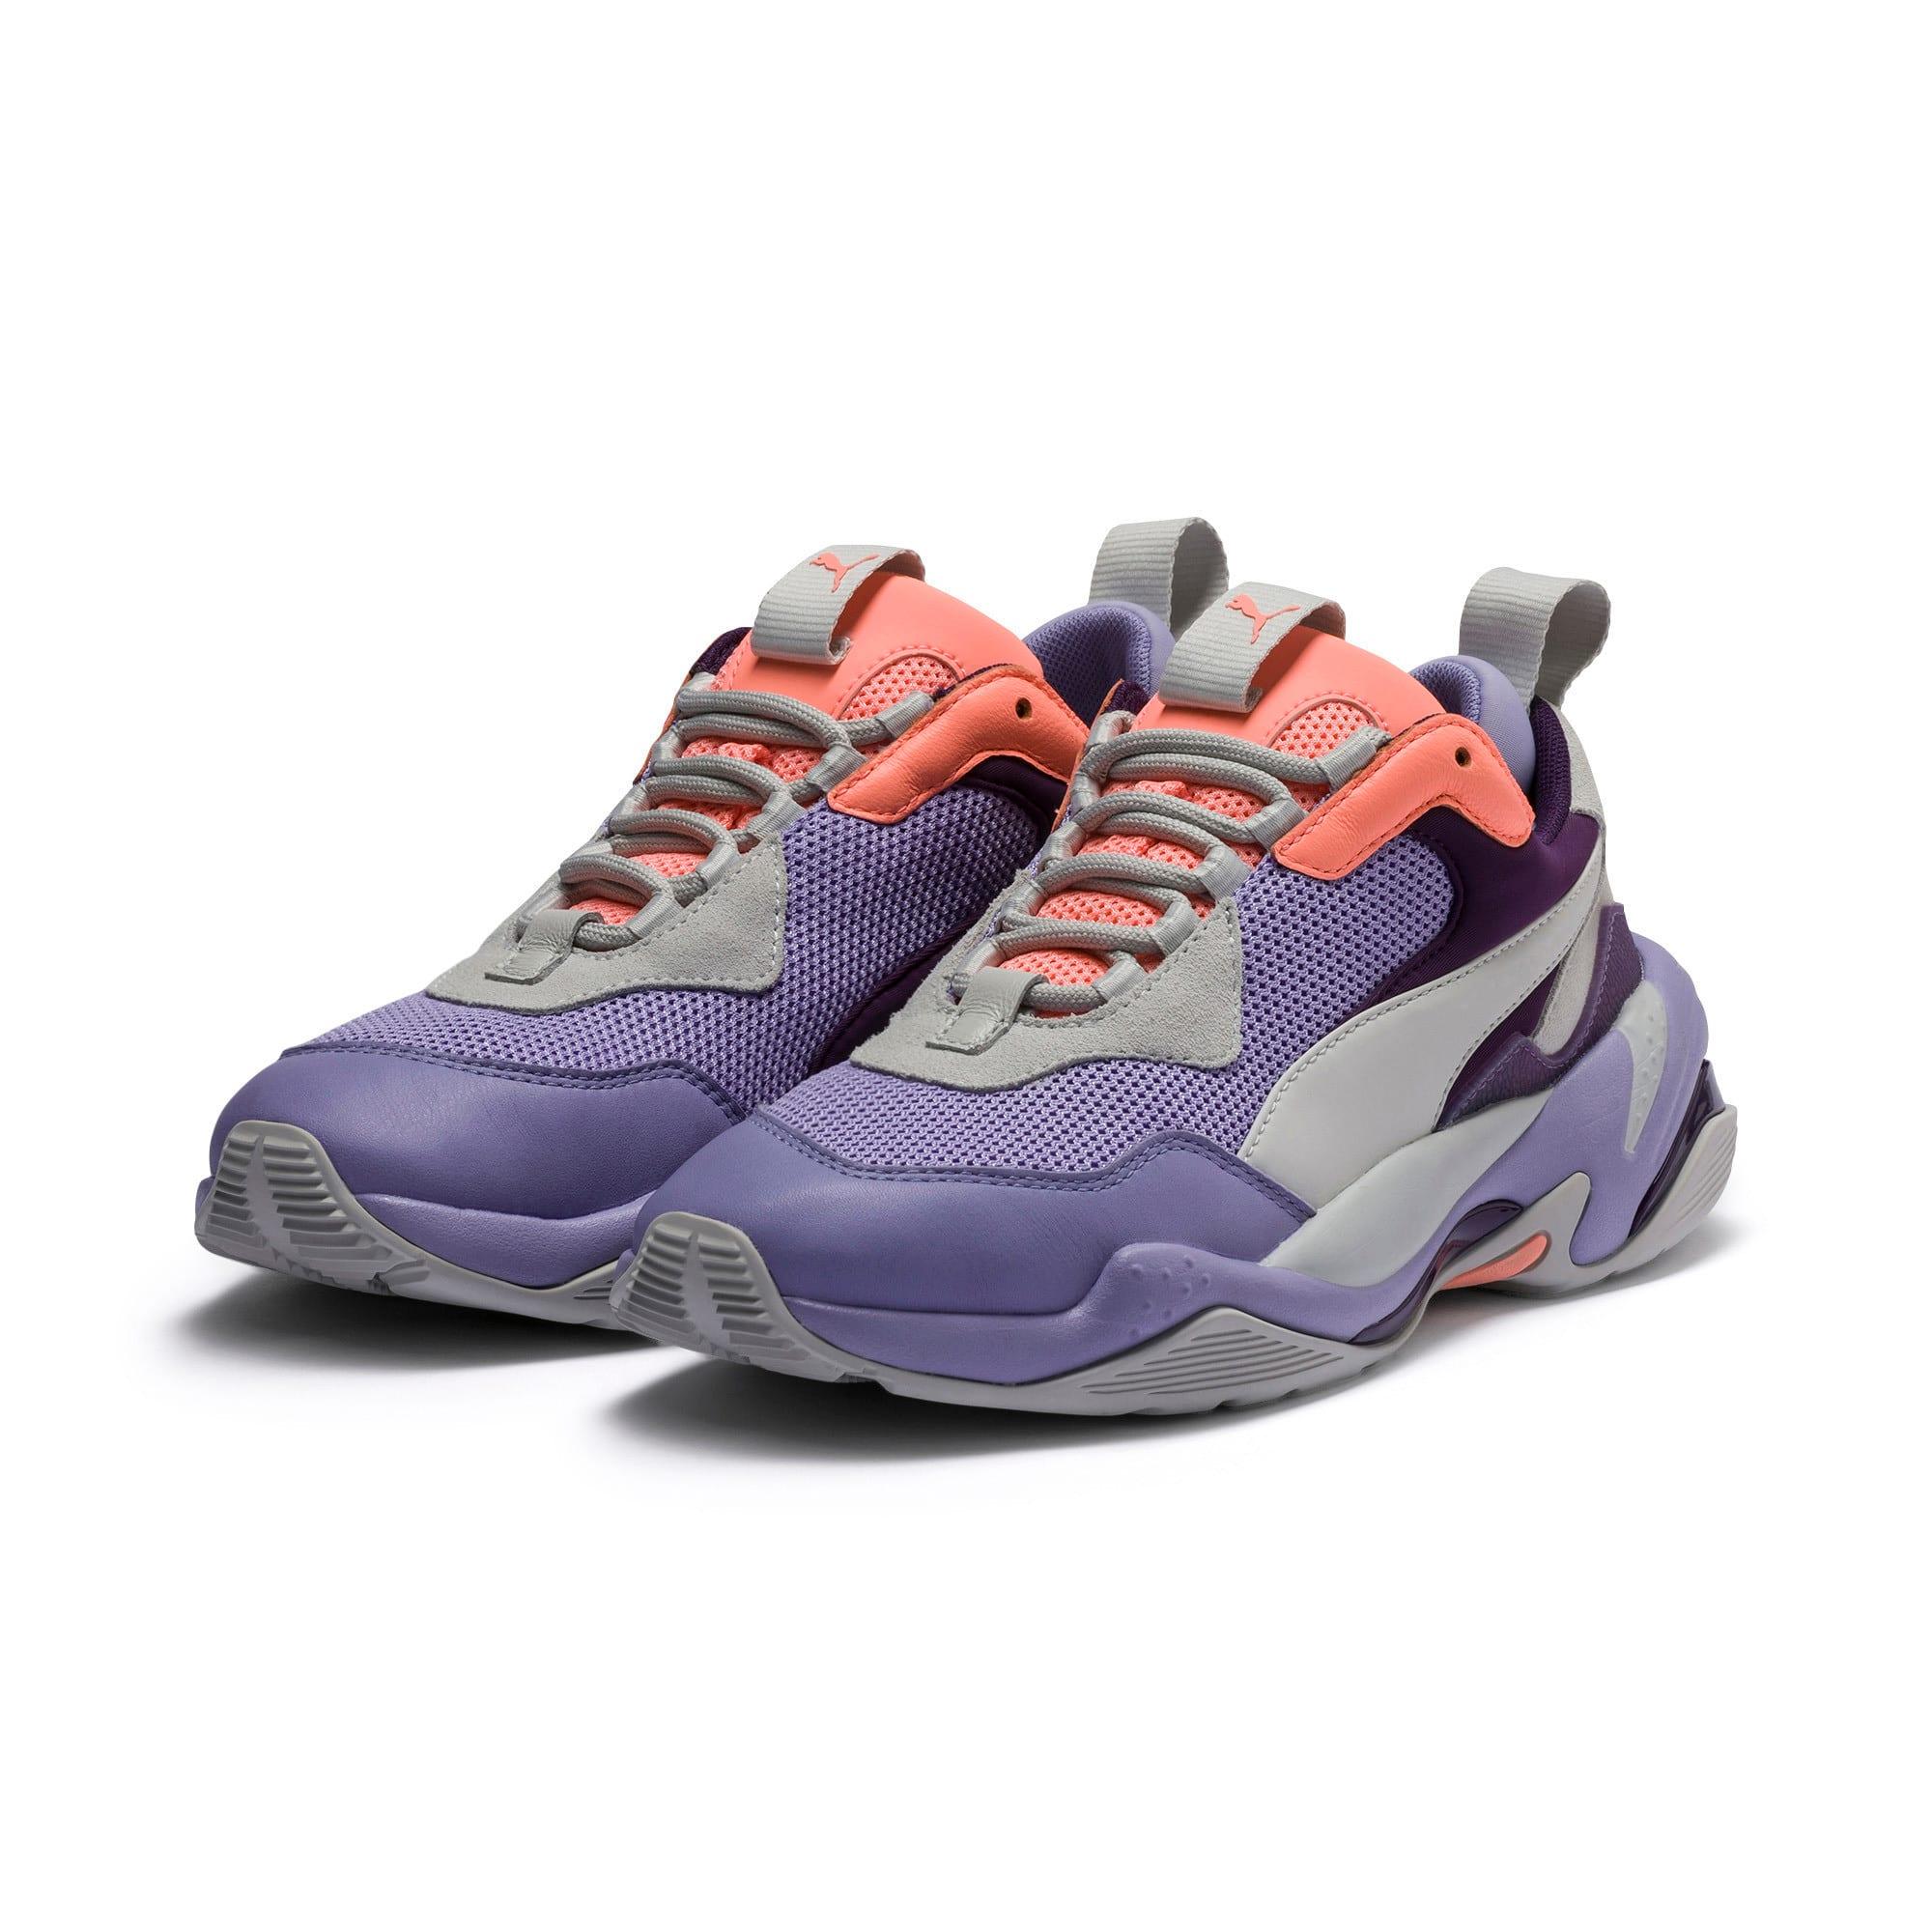 Thumbnail 2 of Thunder Spectra Trainers, Sweet Lavender-Bright Peach, medium